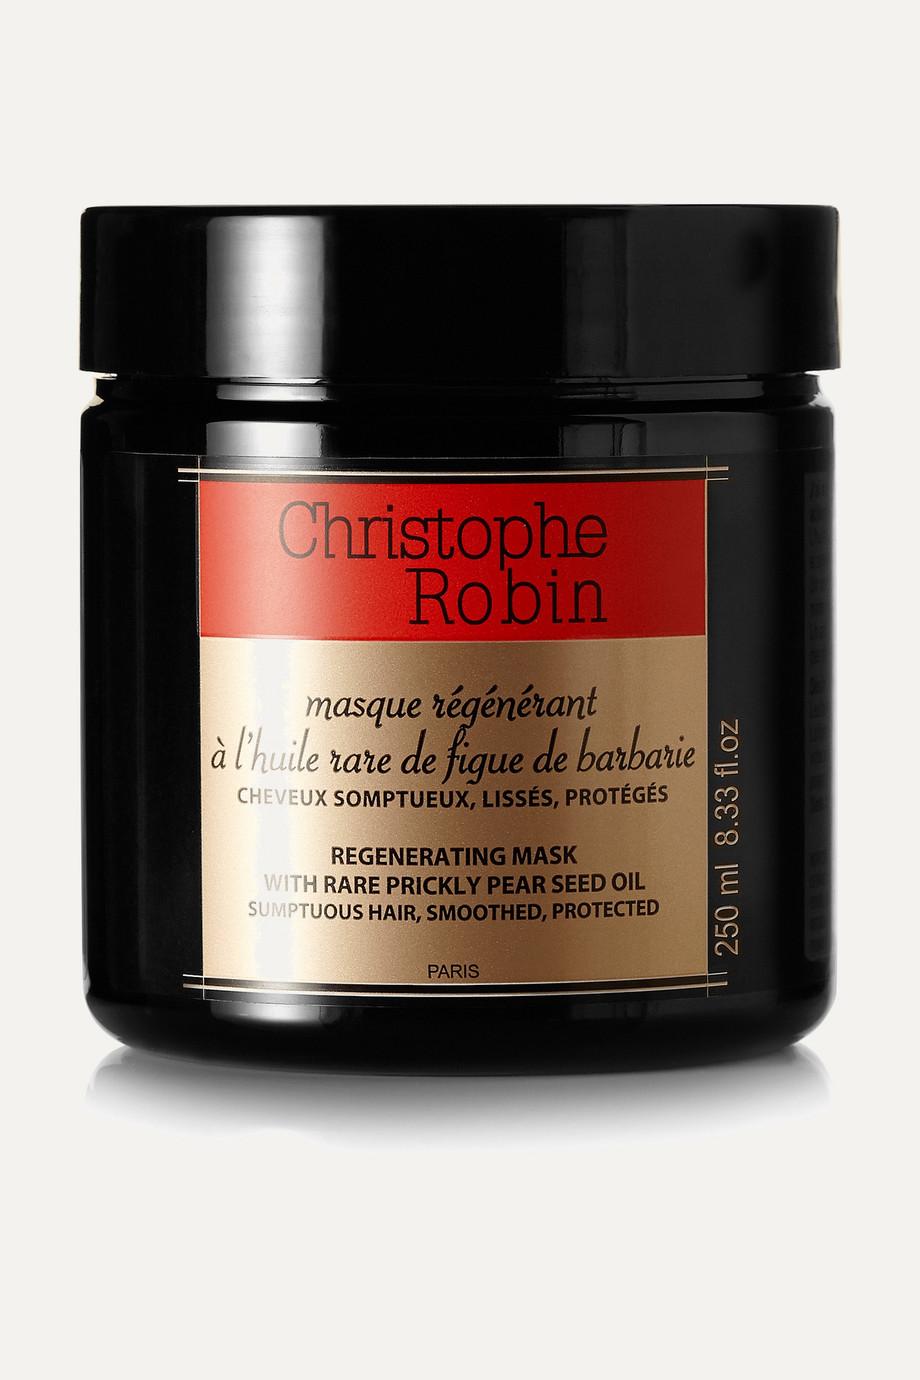 Regenerating Mask, 250ml, by Christophe Robin